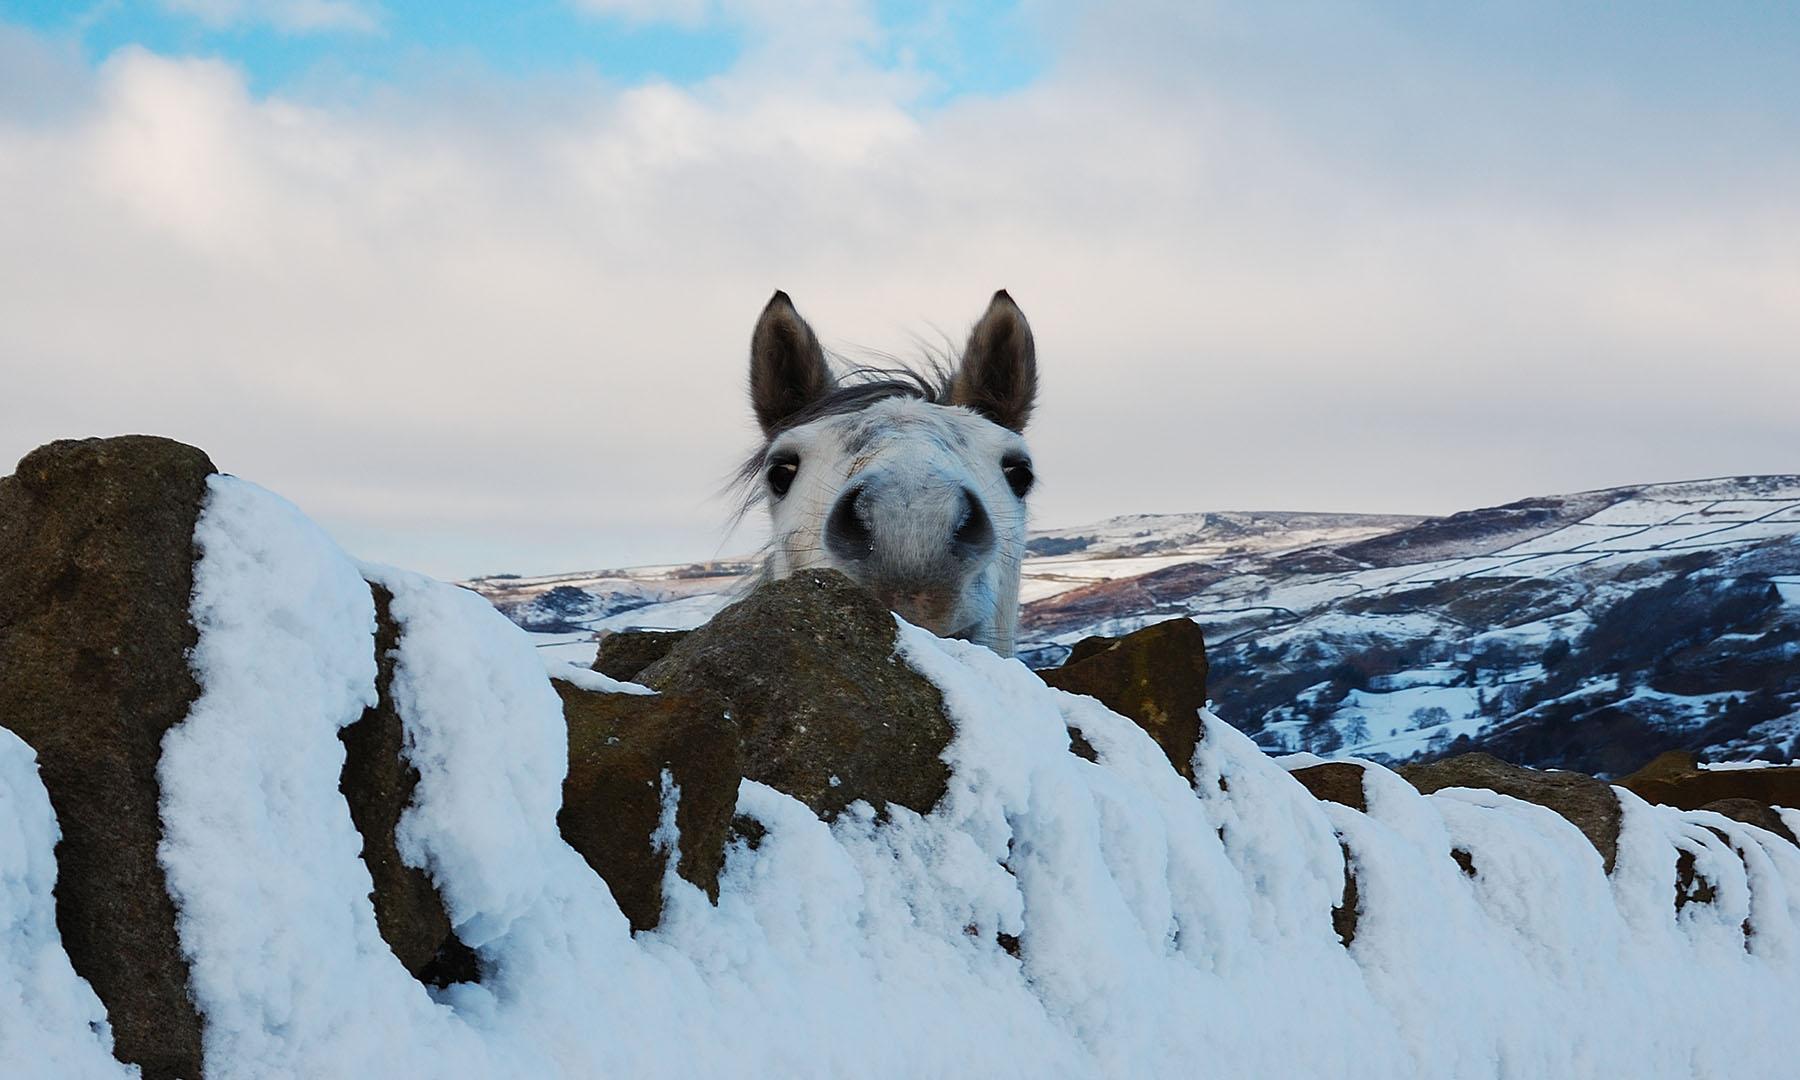 animales super graciosos fotografia (11)